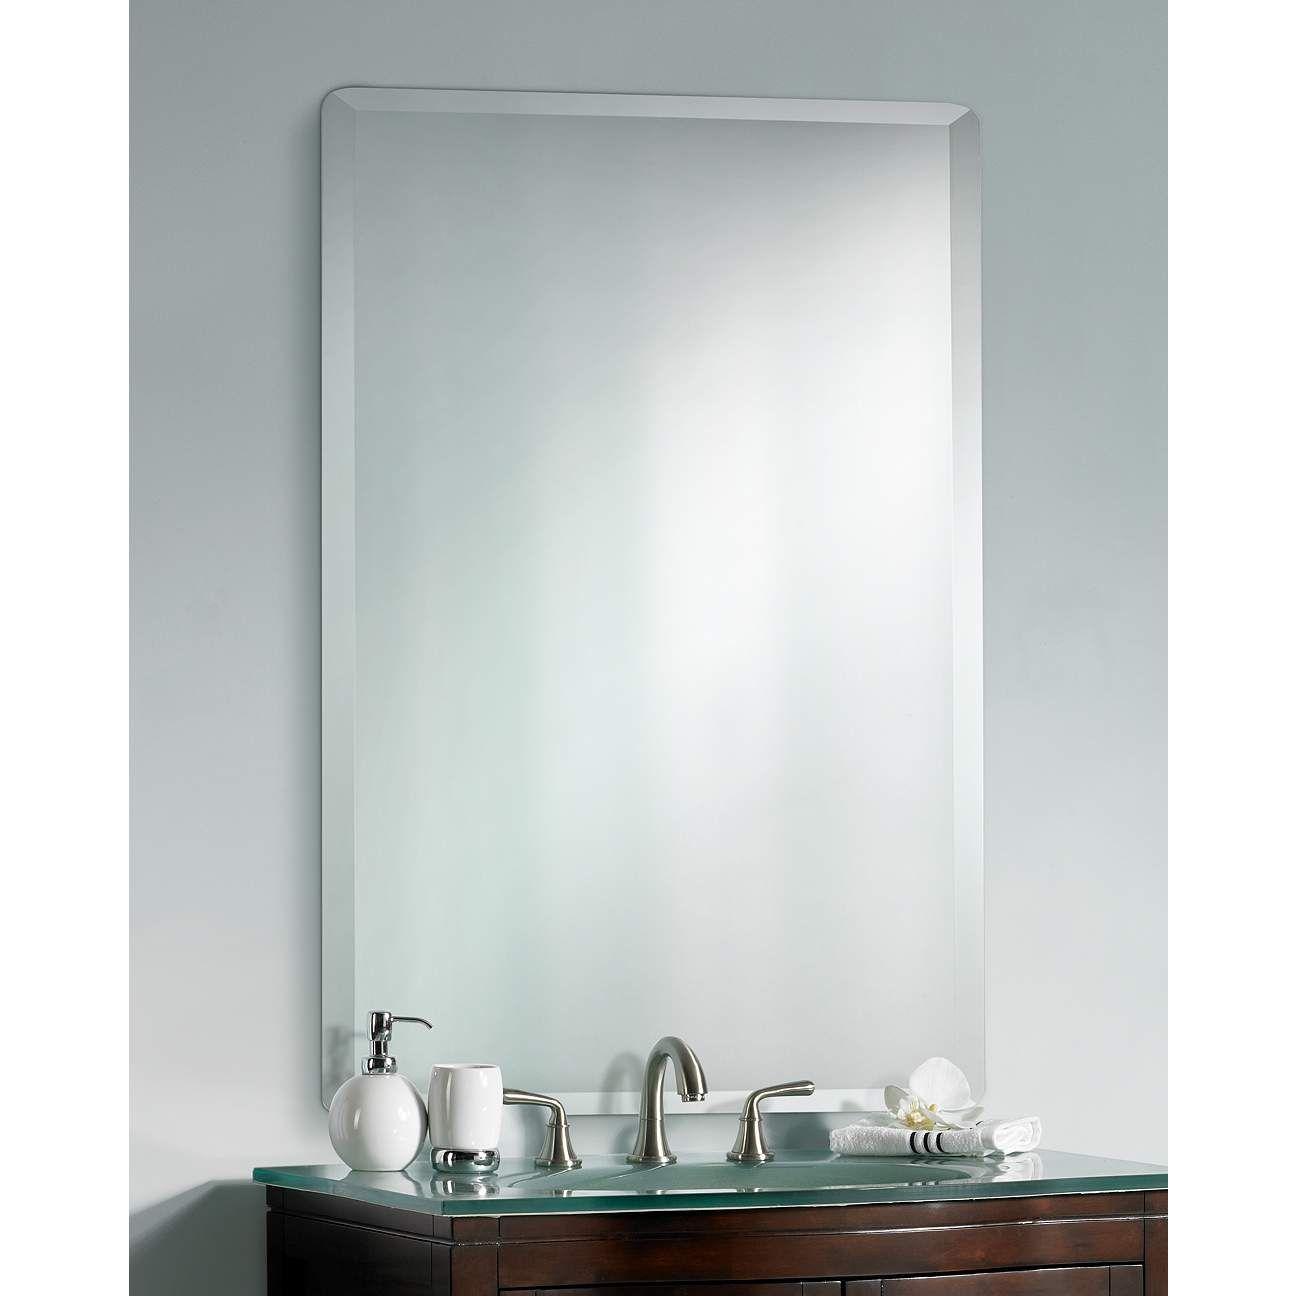 Frameless Rectangular 30 X 40 Beveled Wall Mirror P1394 Lamps Plus In 2021 Mirror Wall Small Bathroom Decor Mirror